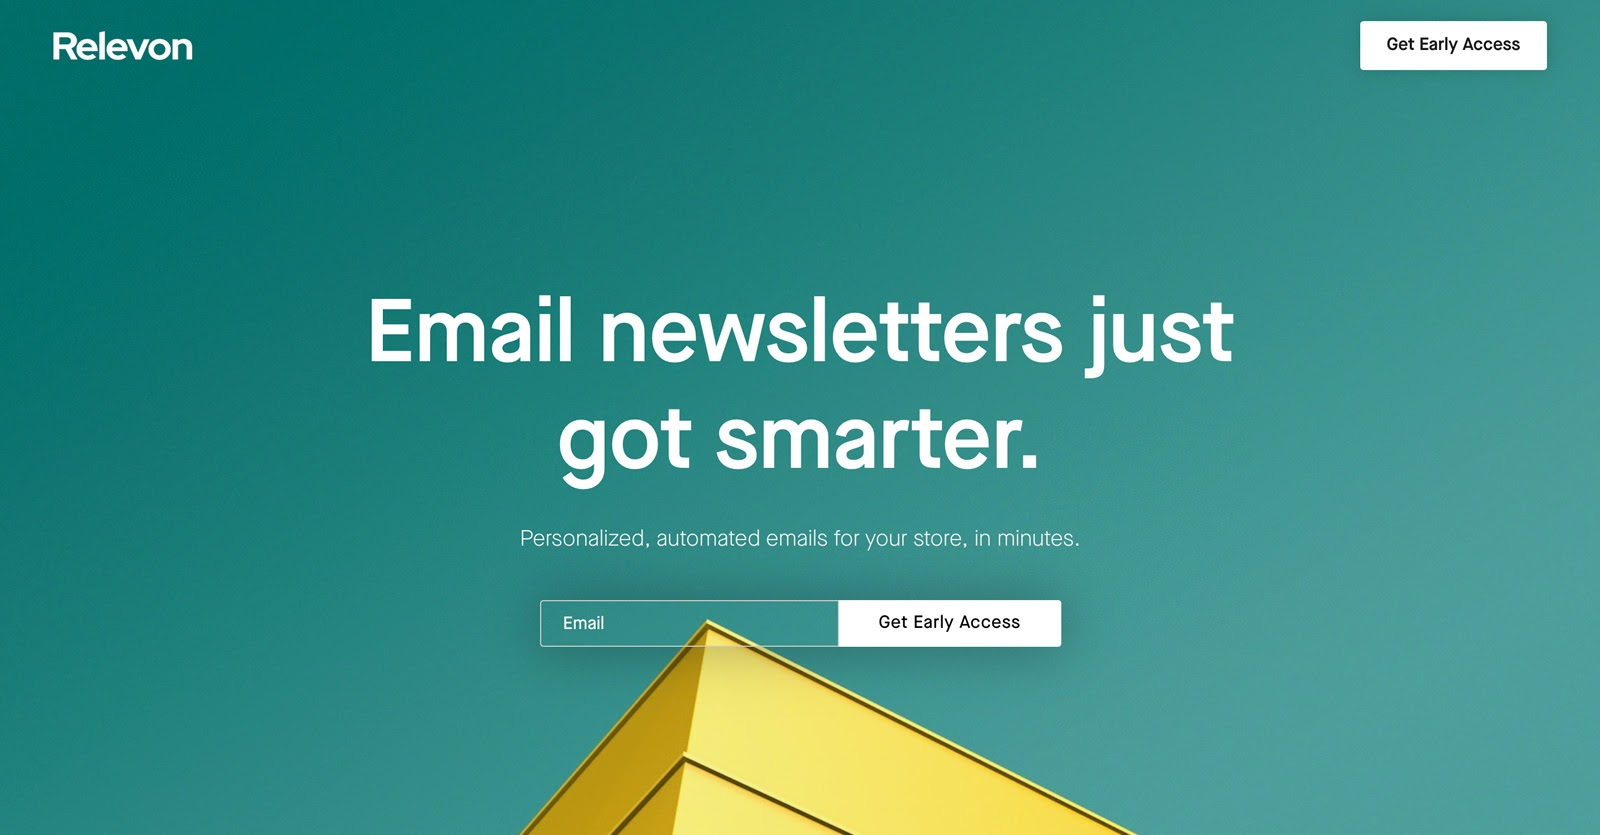 relevon email newsletters